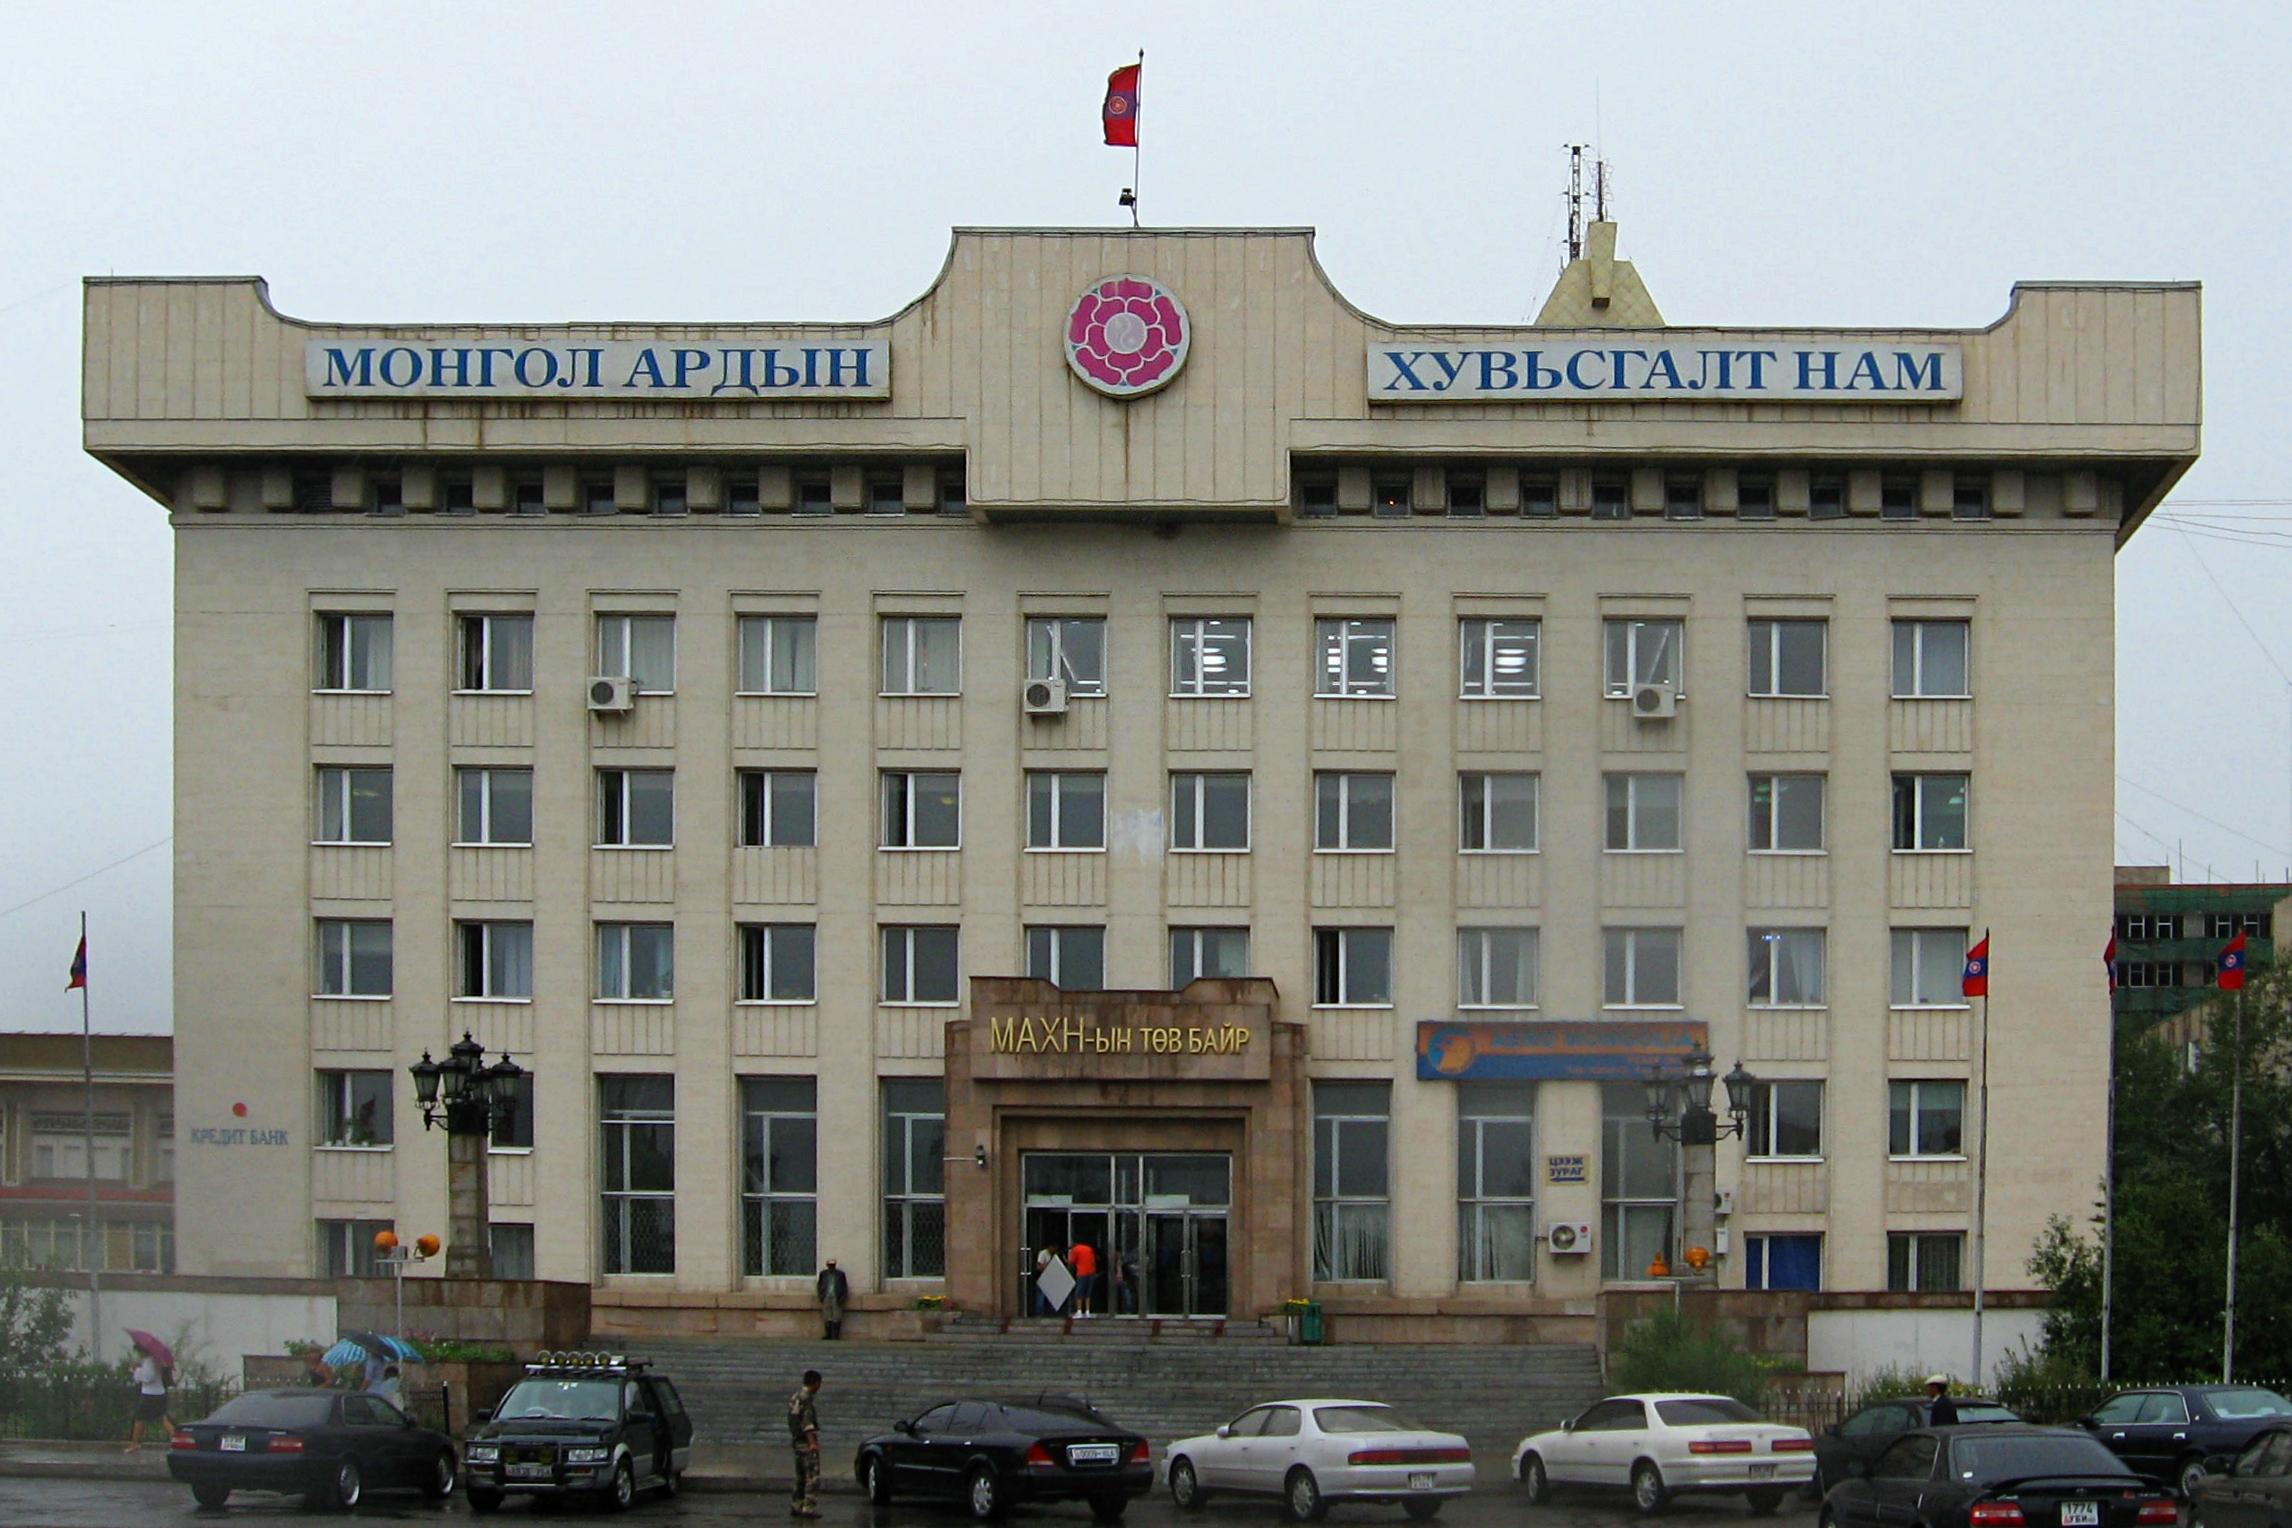 Duda: República Popular de Mongolia. MAXH_building